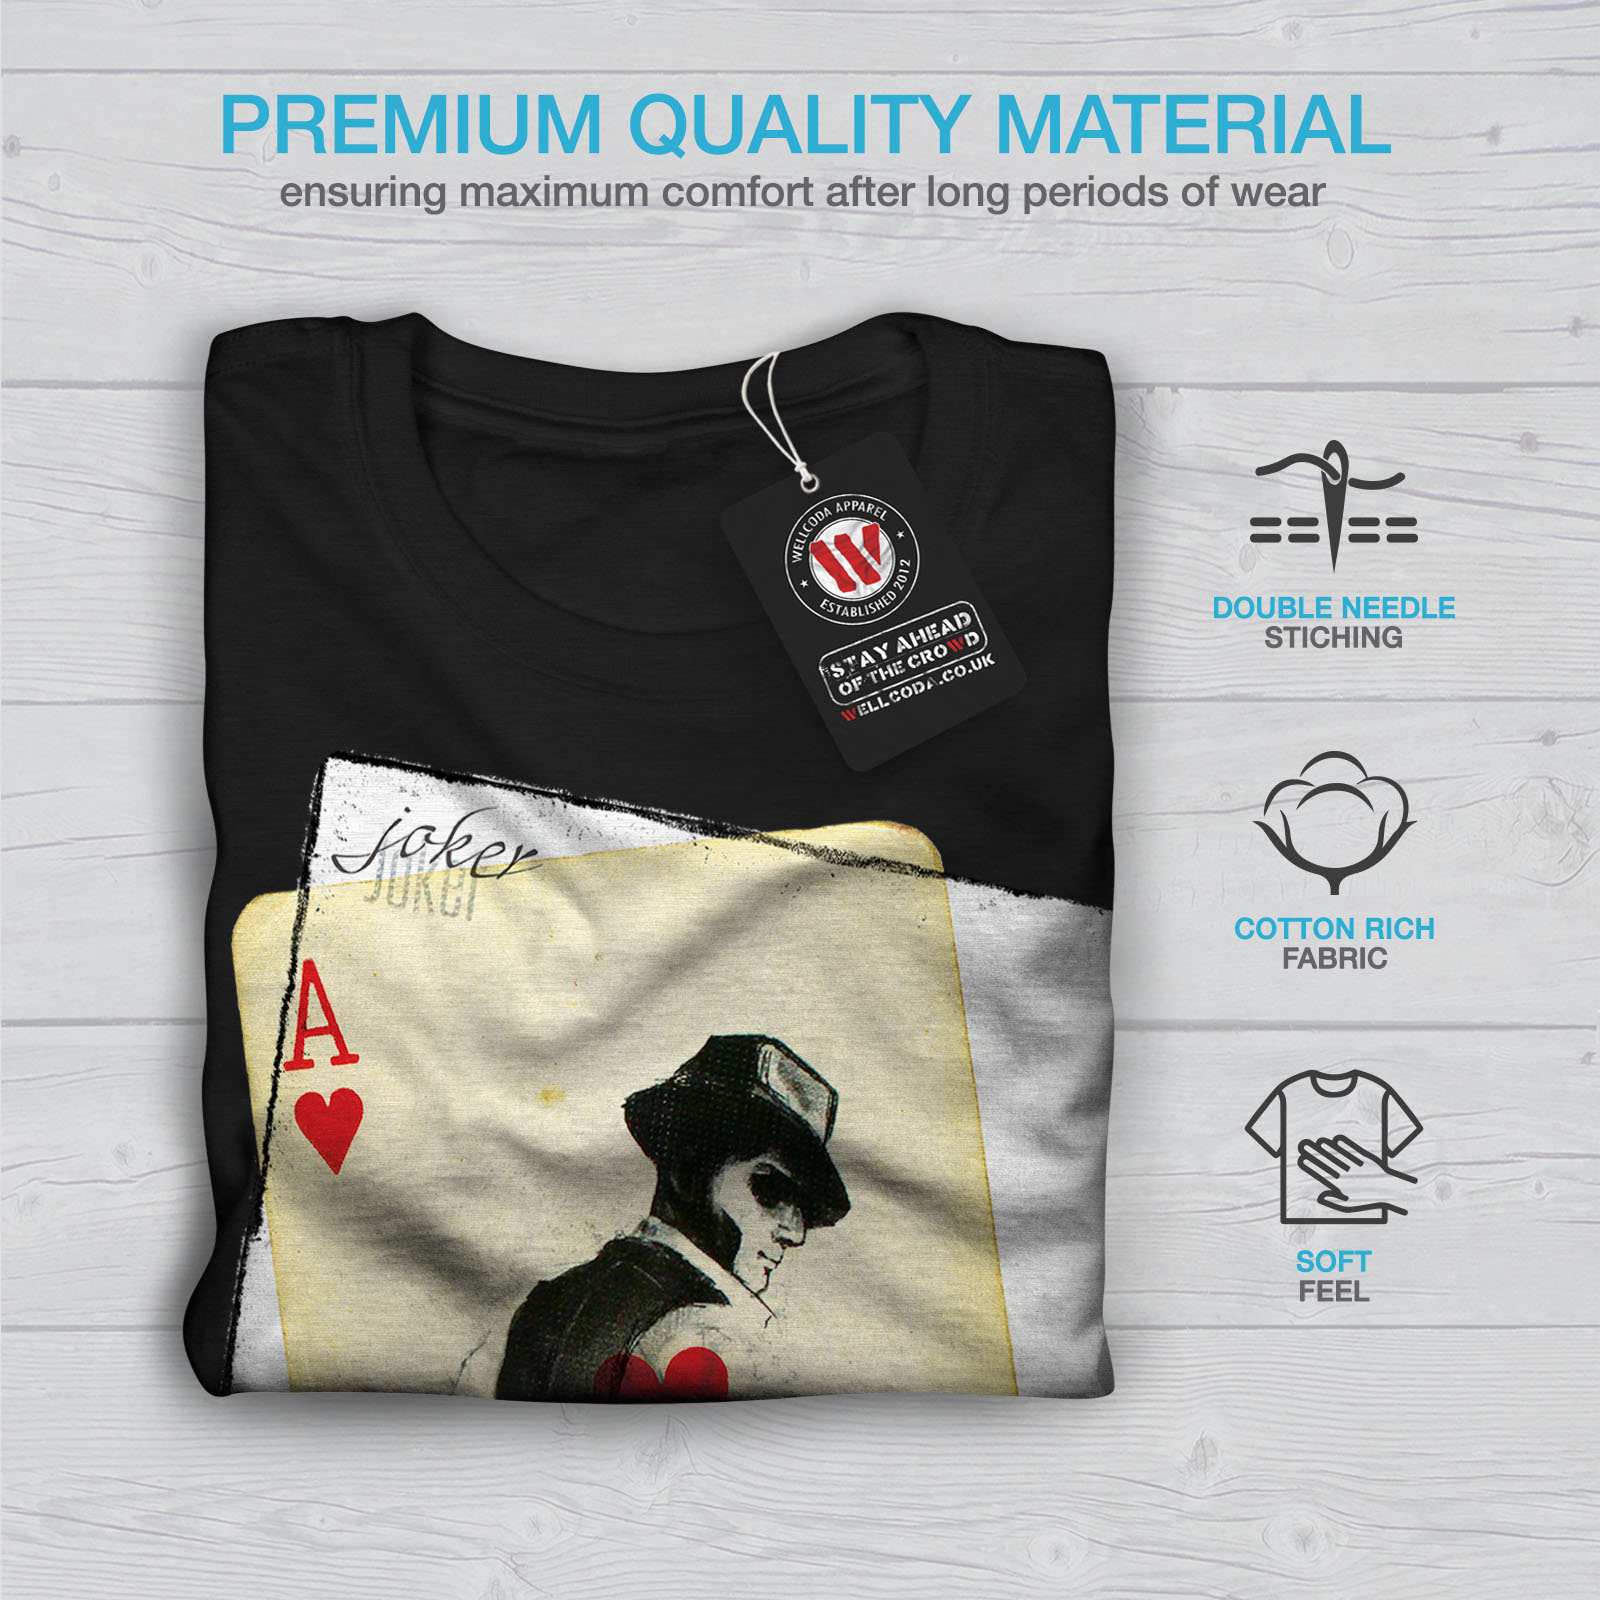 Wellcoda-POKER-misterioso-Da-Uomo-T-shirt-Gamble-design-grafico-stampato-T-shirt miniatura 7